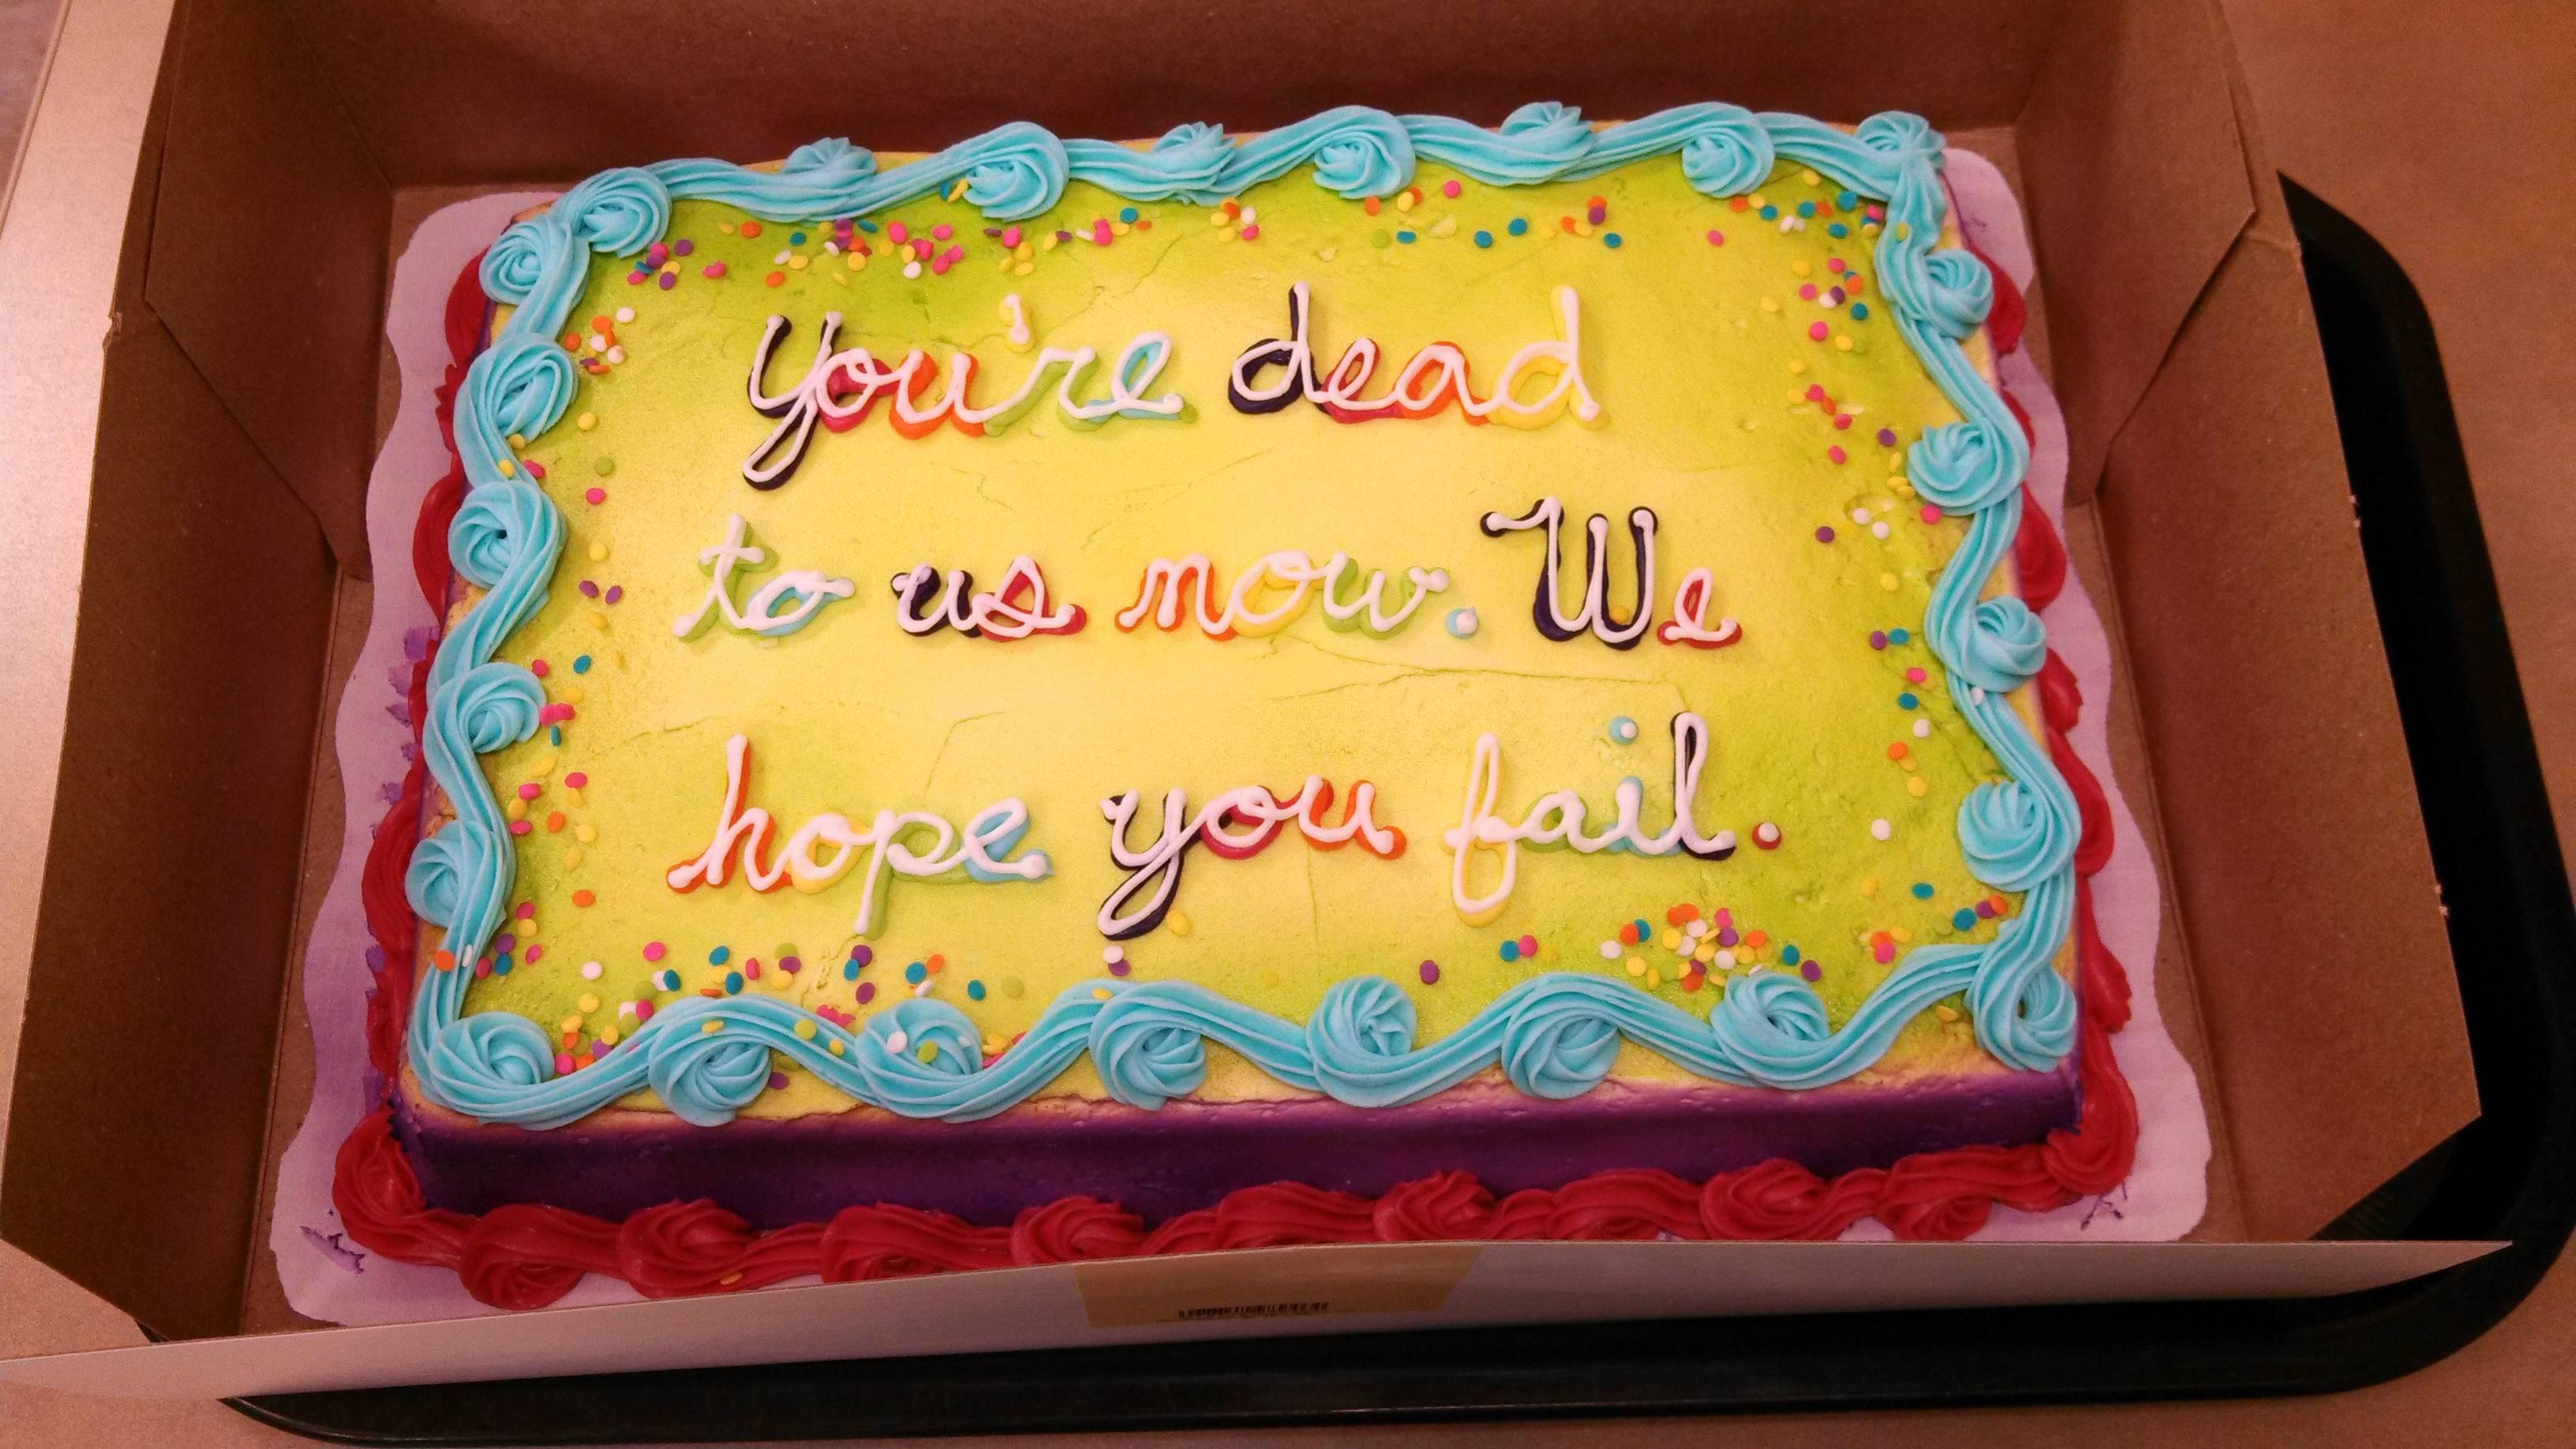 Good Saying To Put On A Going Away Cake